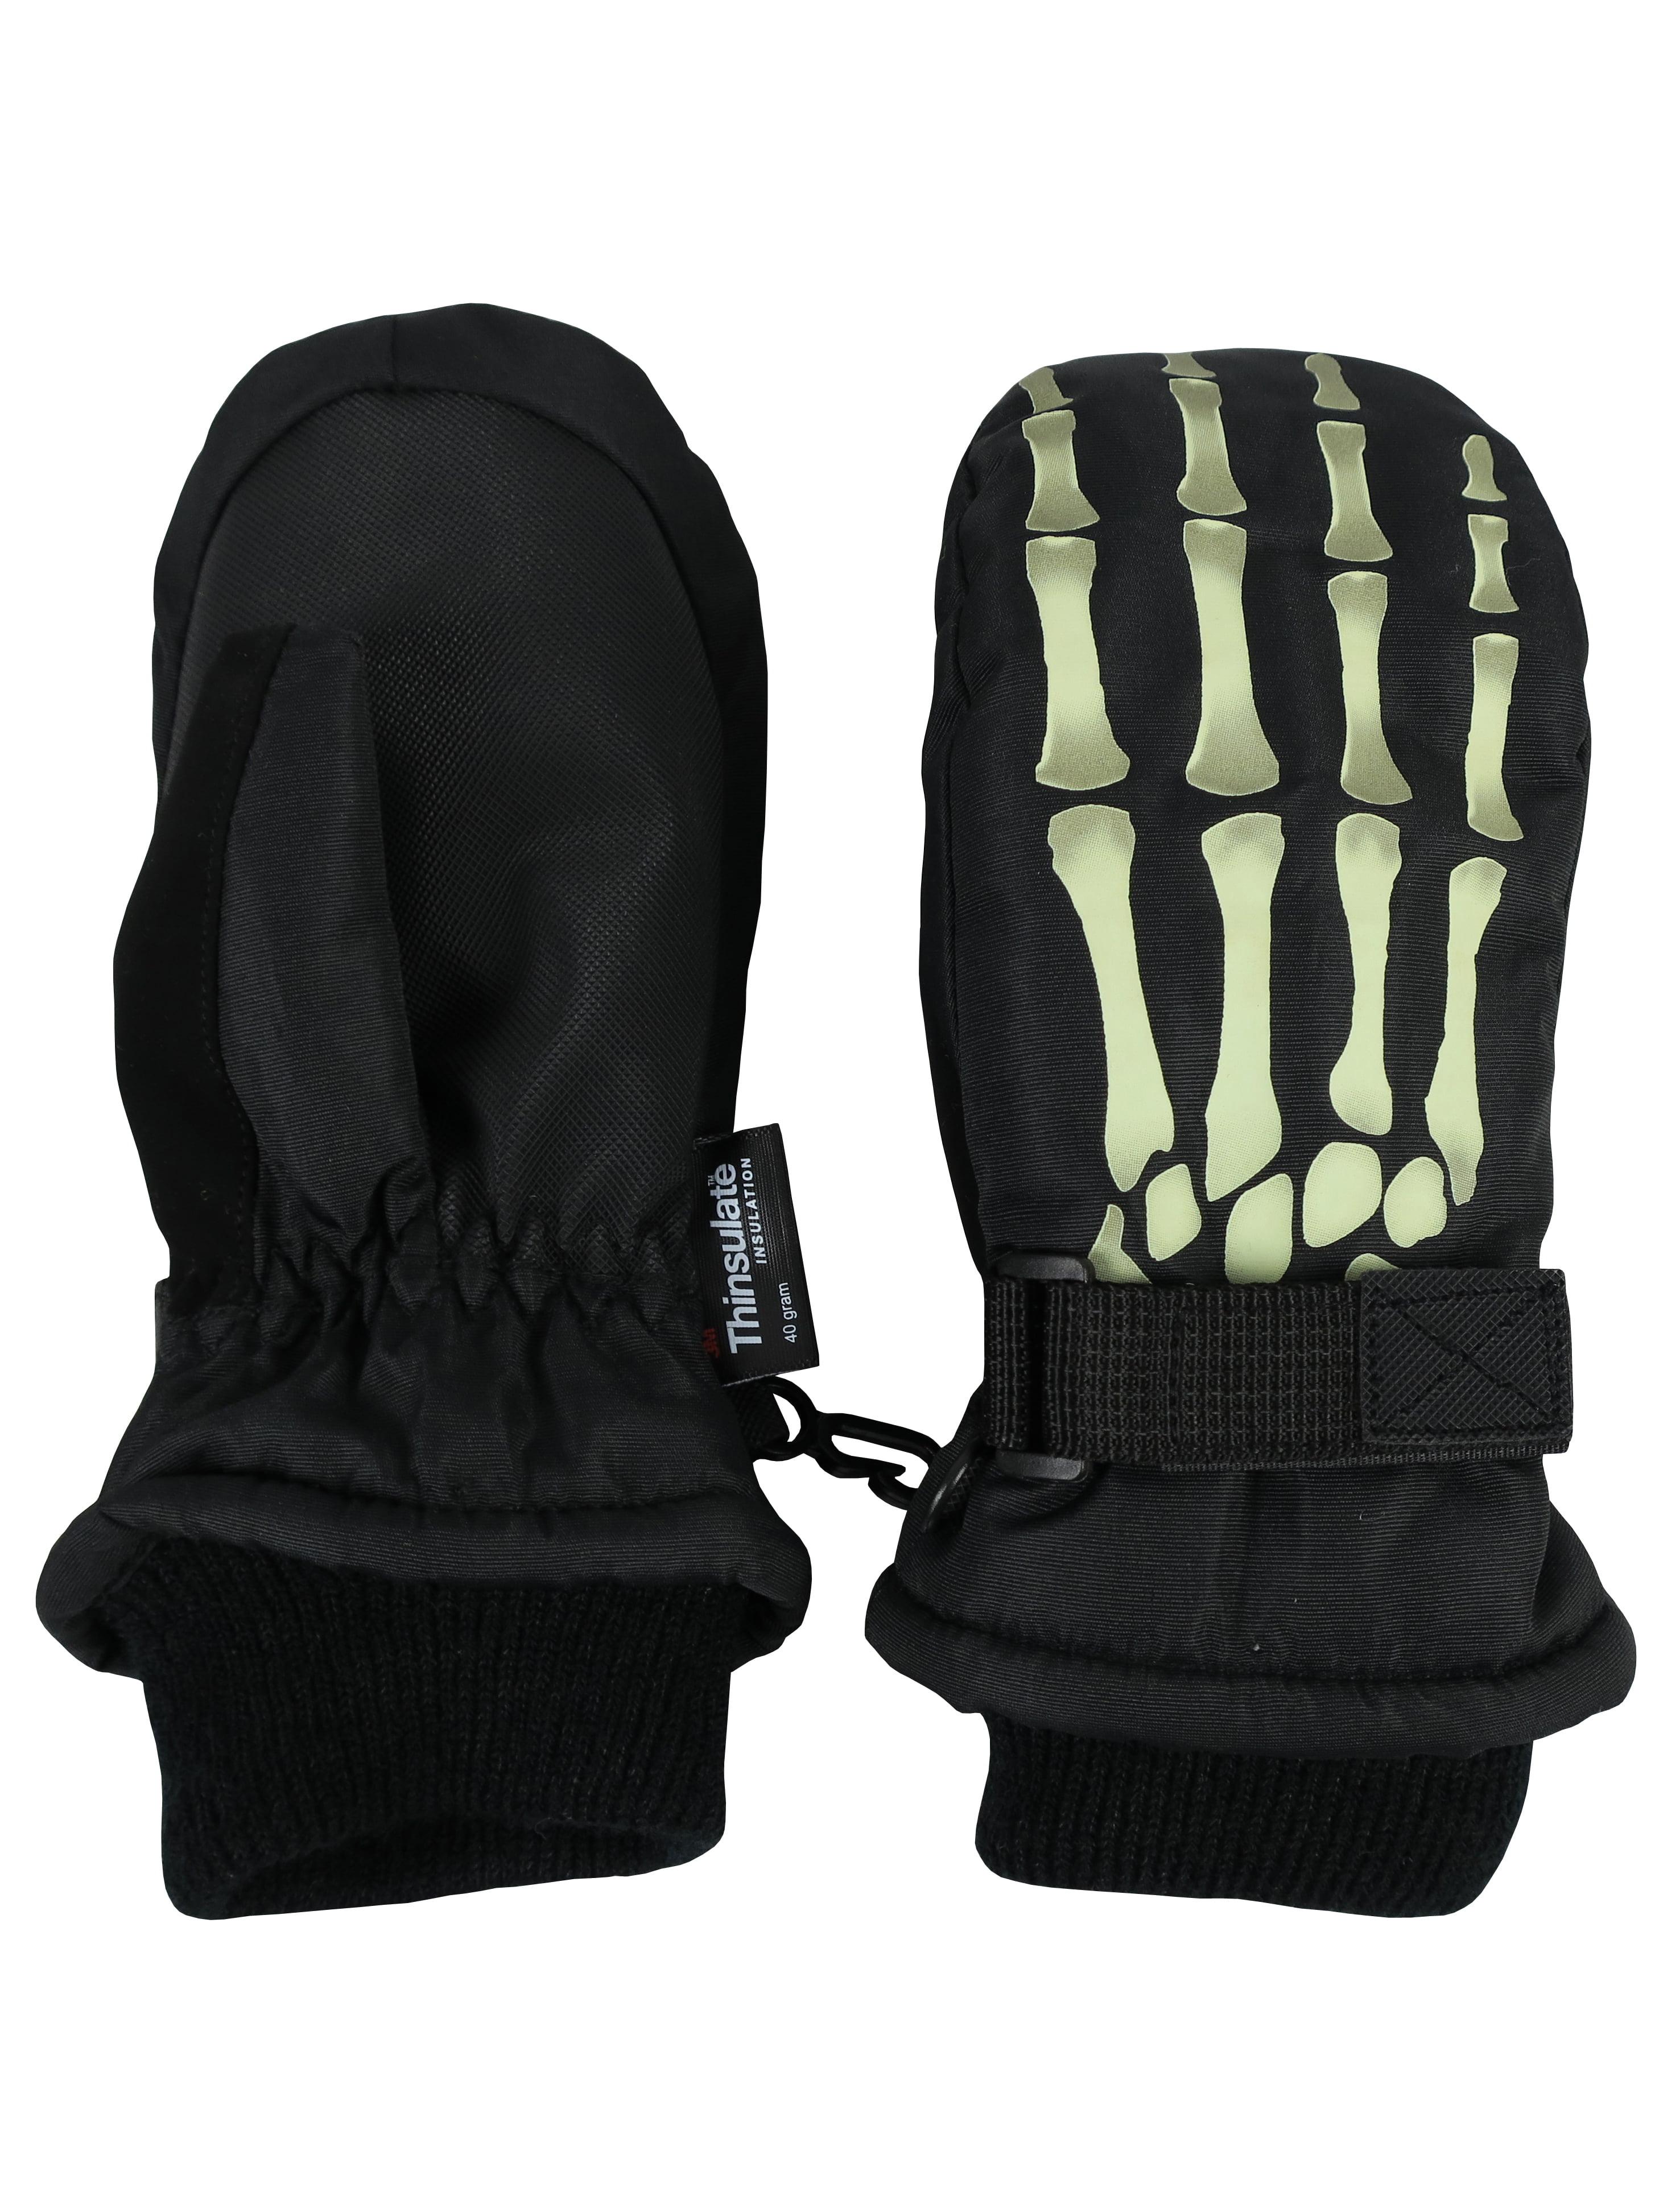 NICE CAPS Boys Kids Youth Skeleton Waterproof Thinsulate Ski Snow Winter Gloves